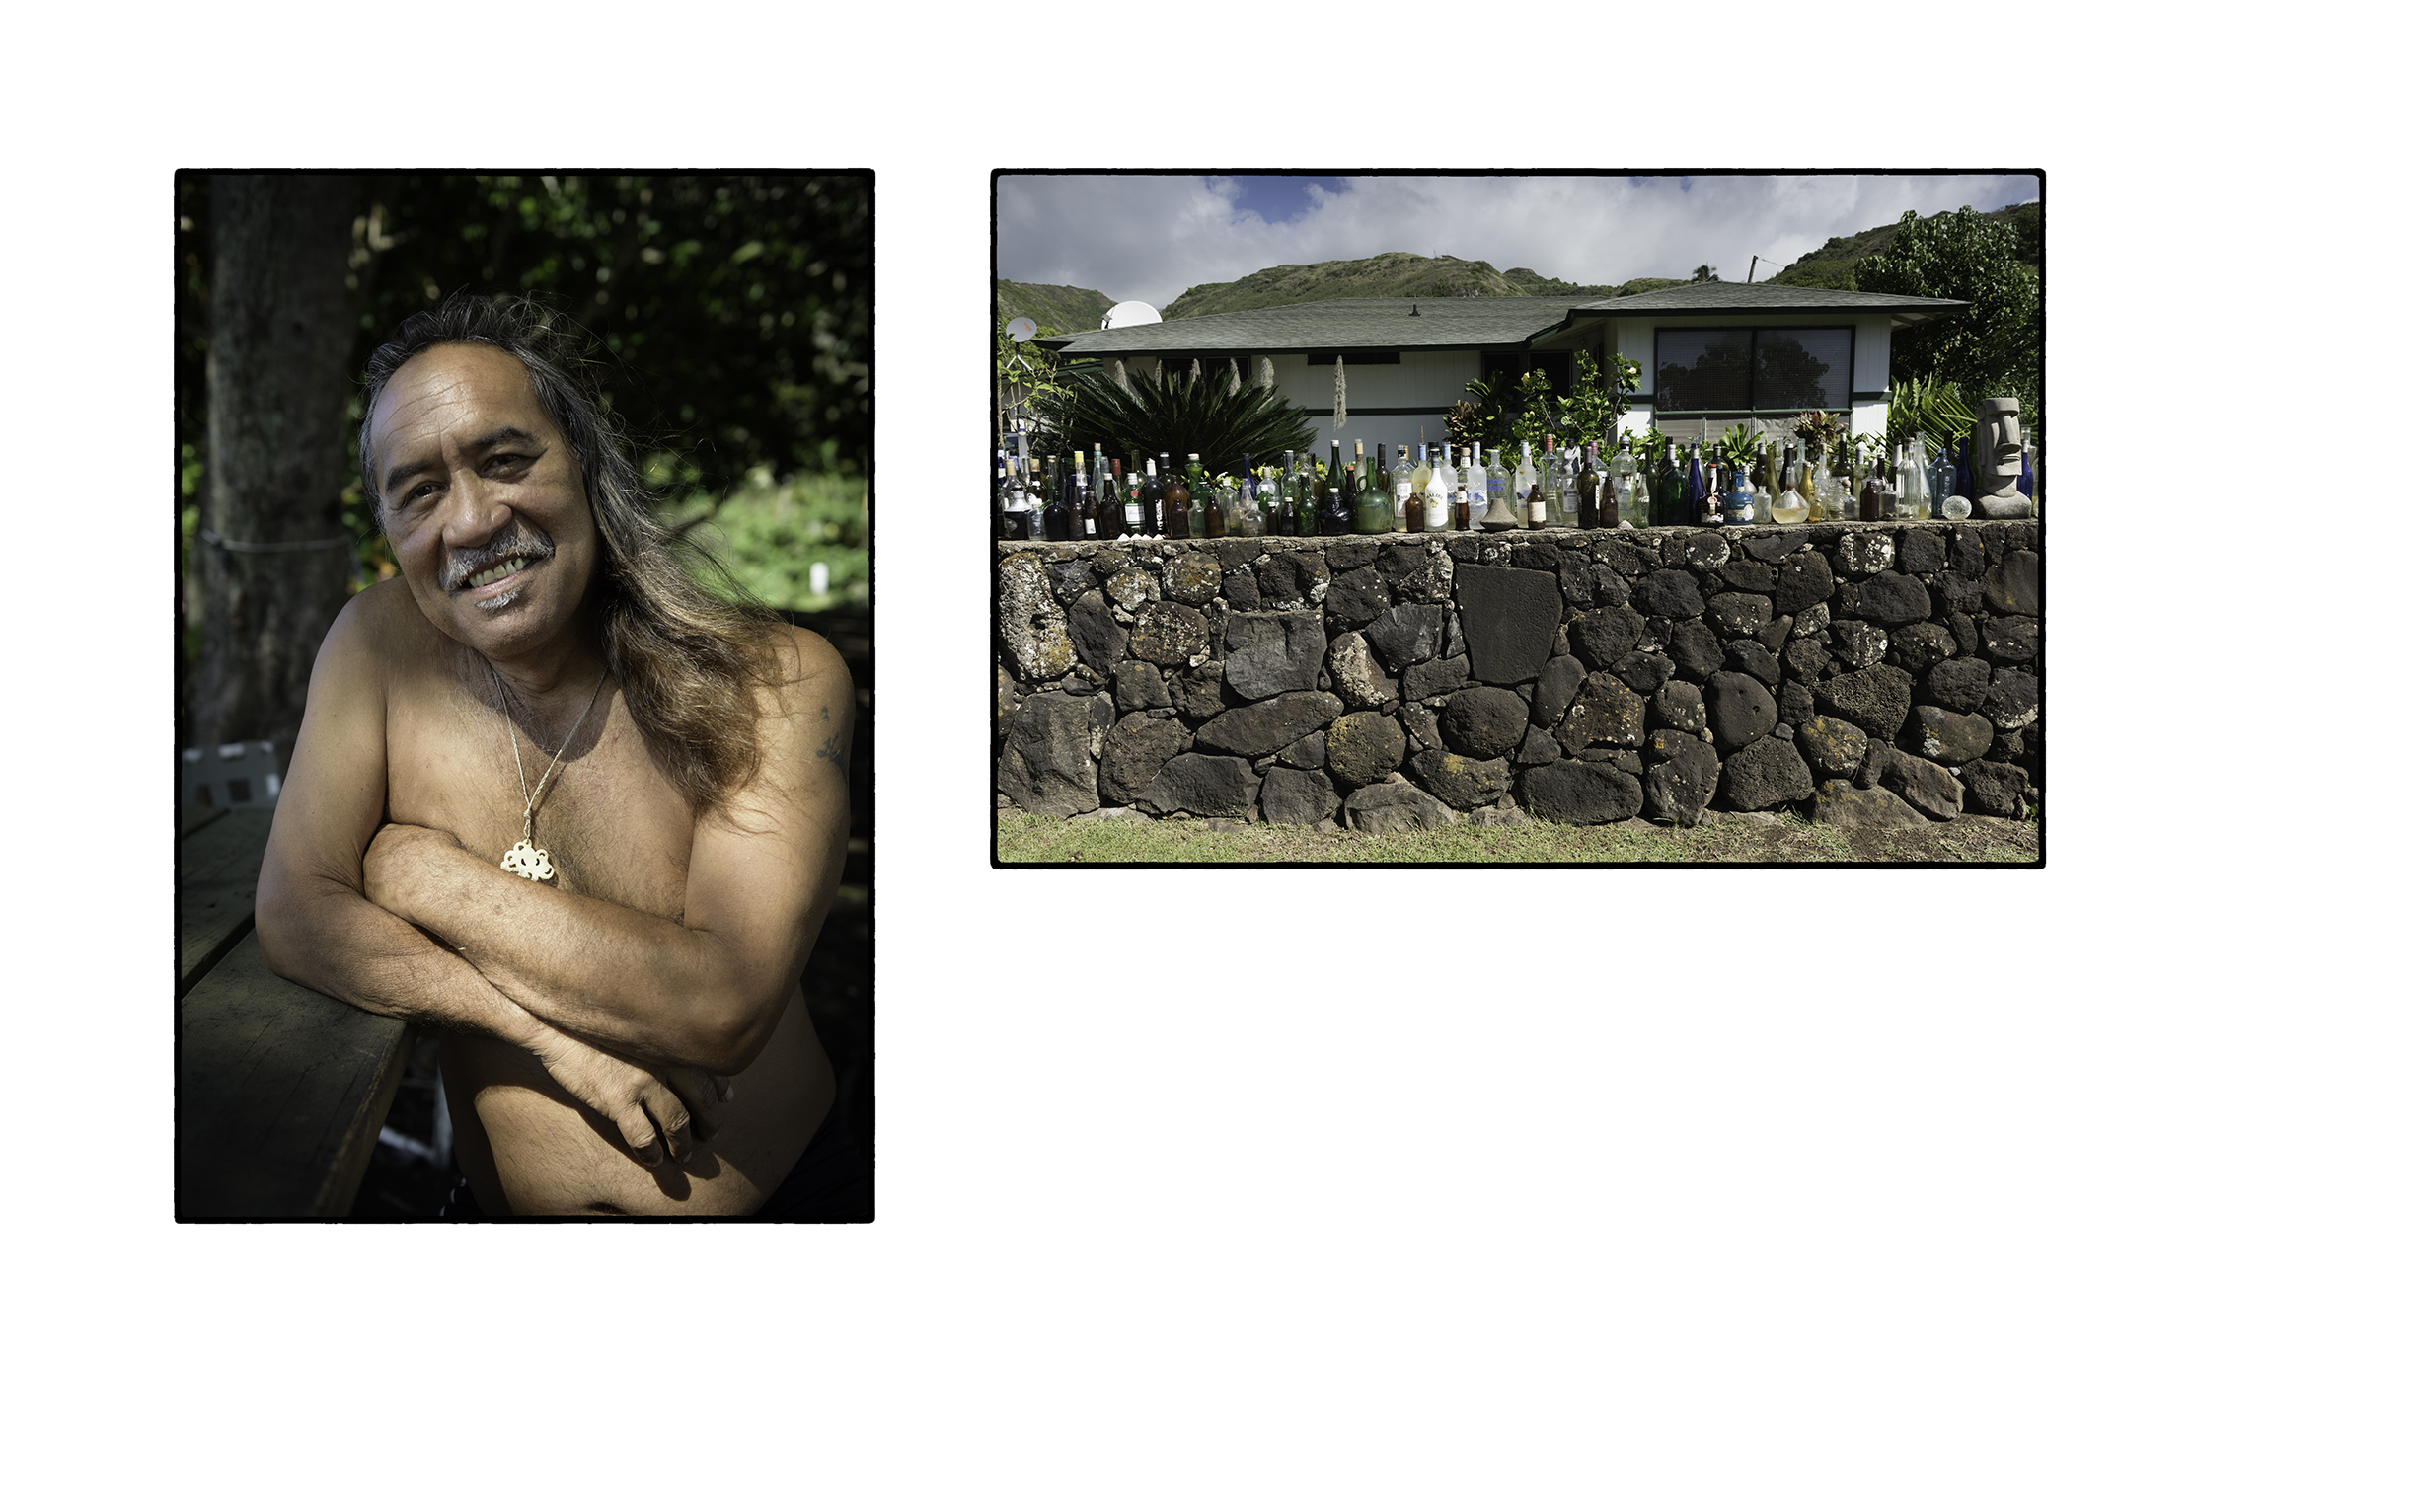 Keolo's father, Eddie Tanaka, and their home